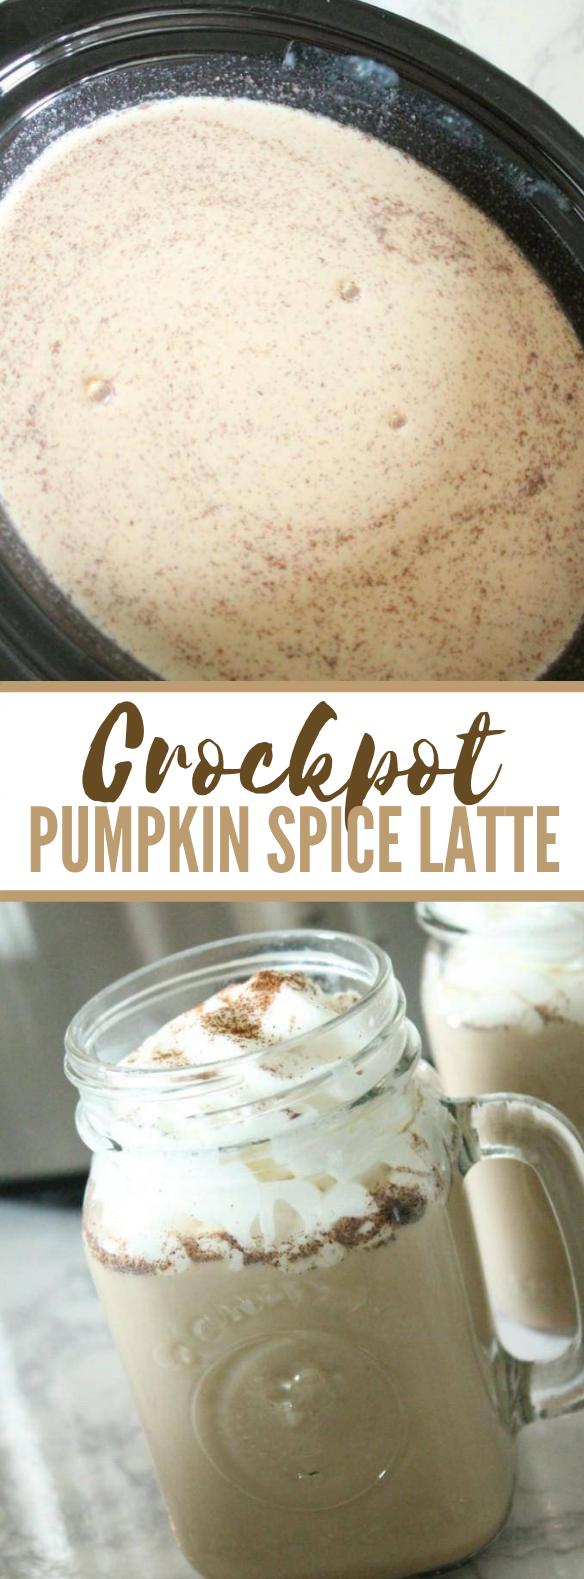 Crockpot Pumpkin Spice Latte Recipe #drinks #falldrink